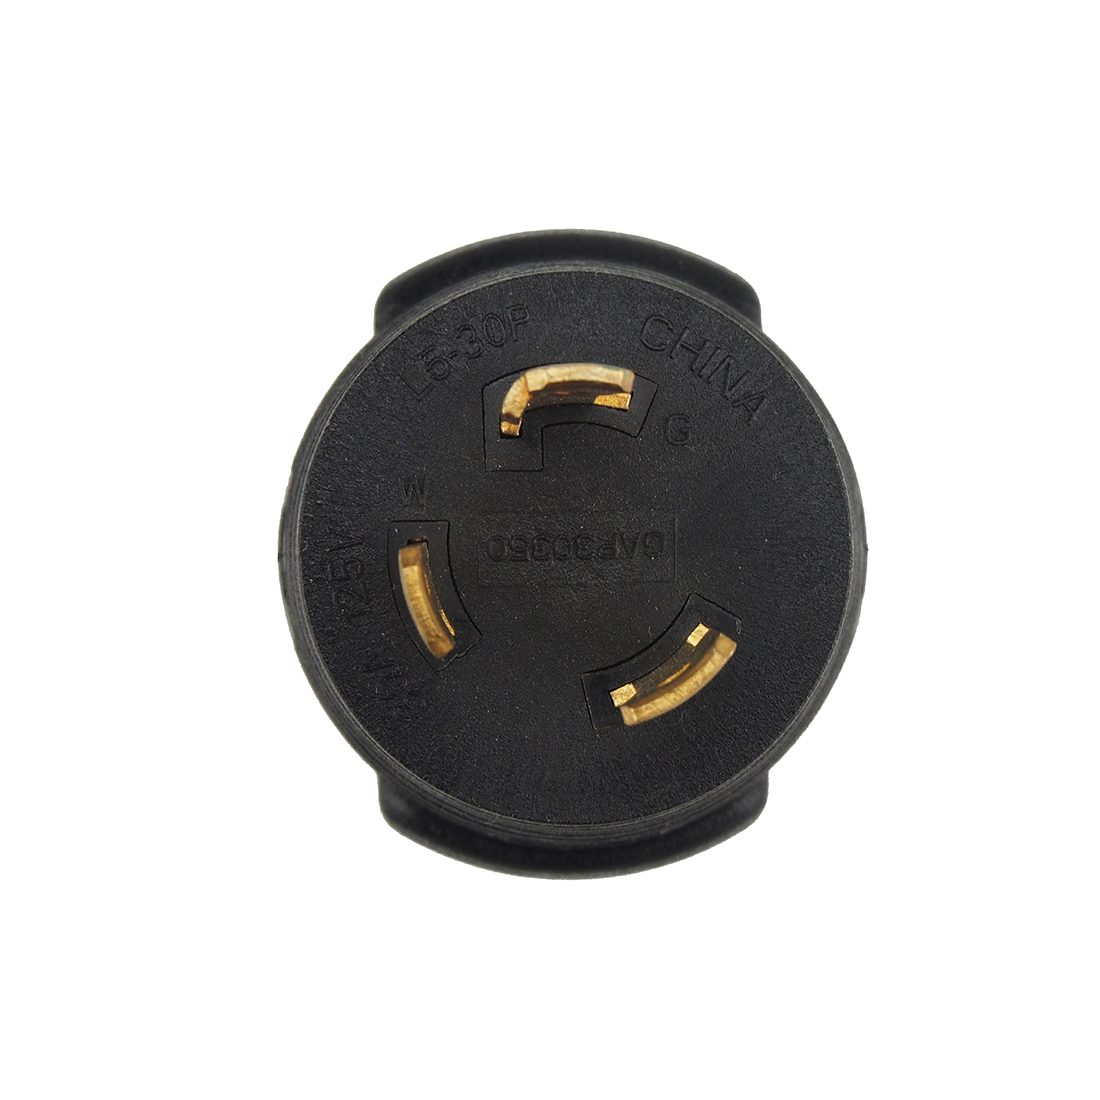 JORINDO [L5-30P до 14-50R] Plugrand Nema L5-30 30 штекер до 14-50 50 Ампер адаптер генератора, Nema L5-30P до 14-50R